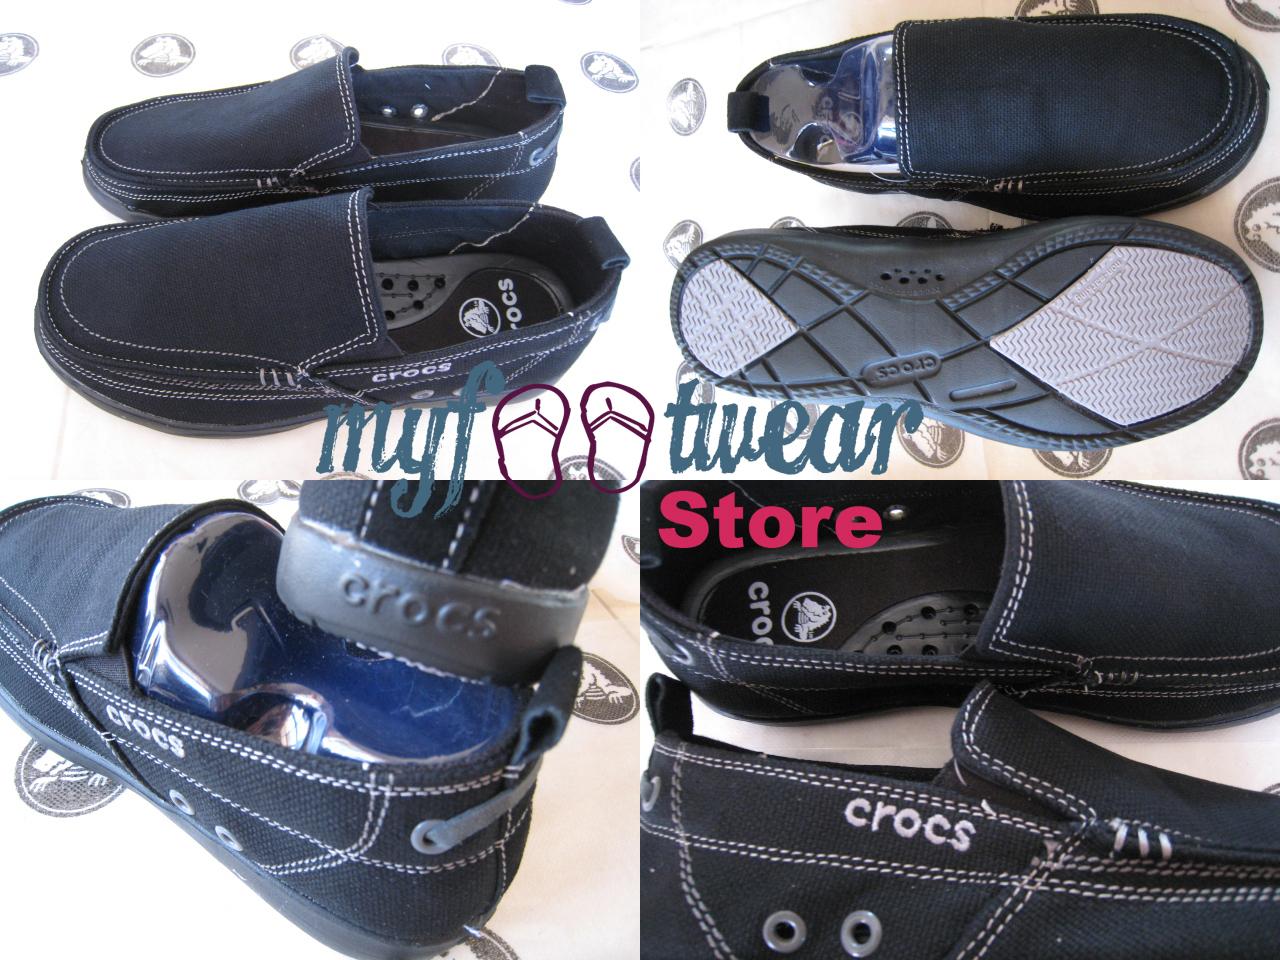 MyFootWearStore - Pusat Sepatu Crocs Murah Surabaya: Walu Men